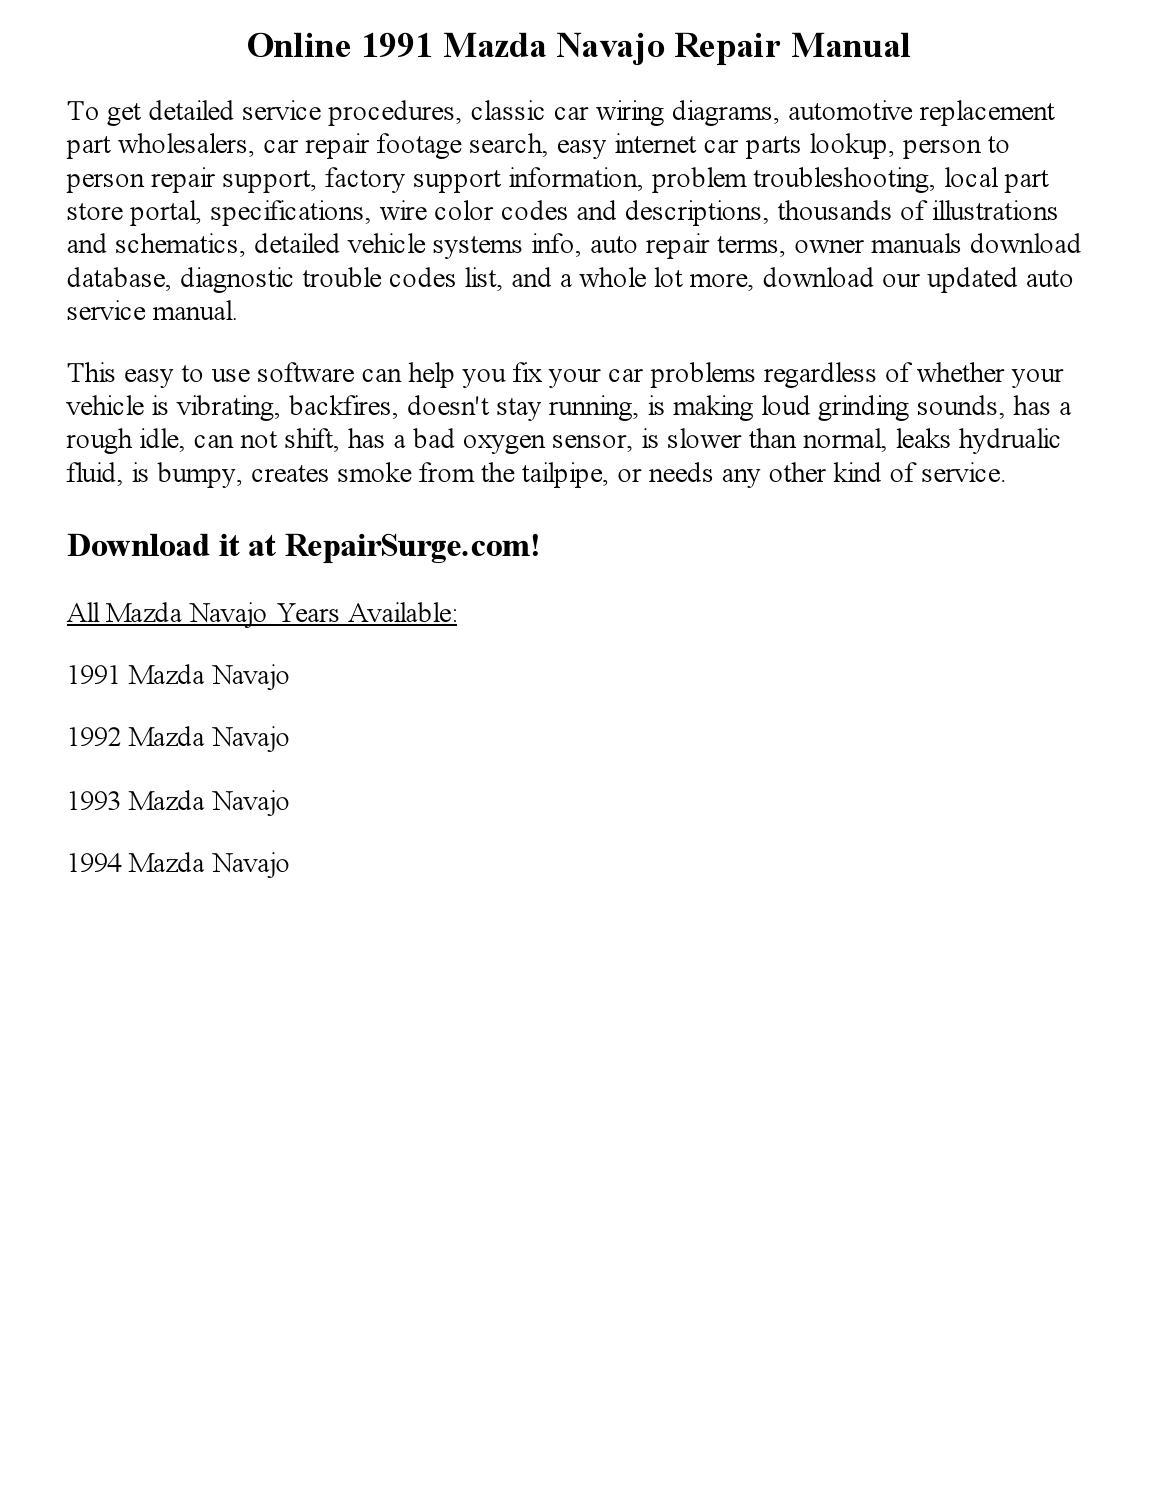 1991 Mazda Navajo Repair Manual Online by Glen D Charron - issuu